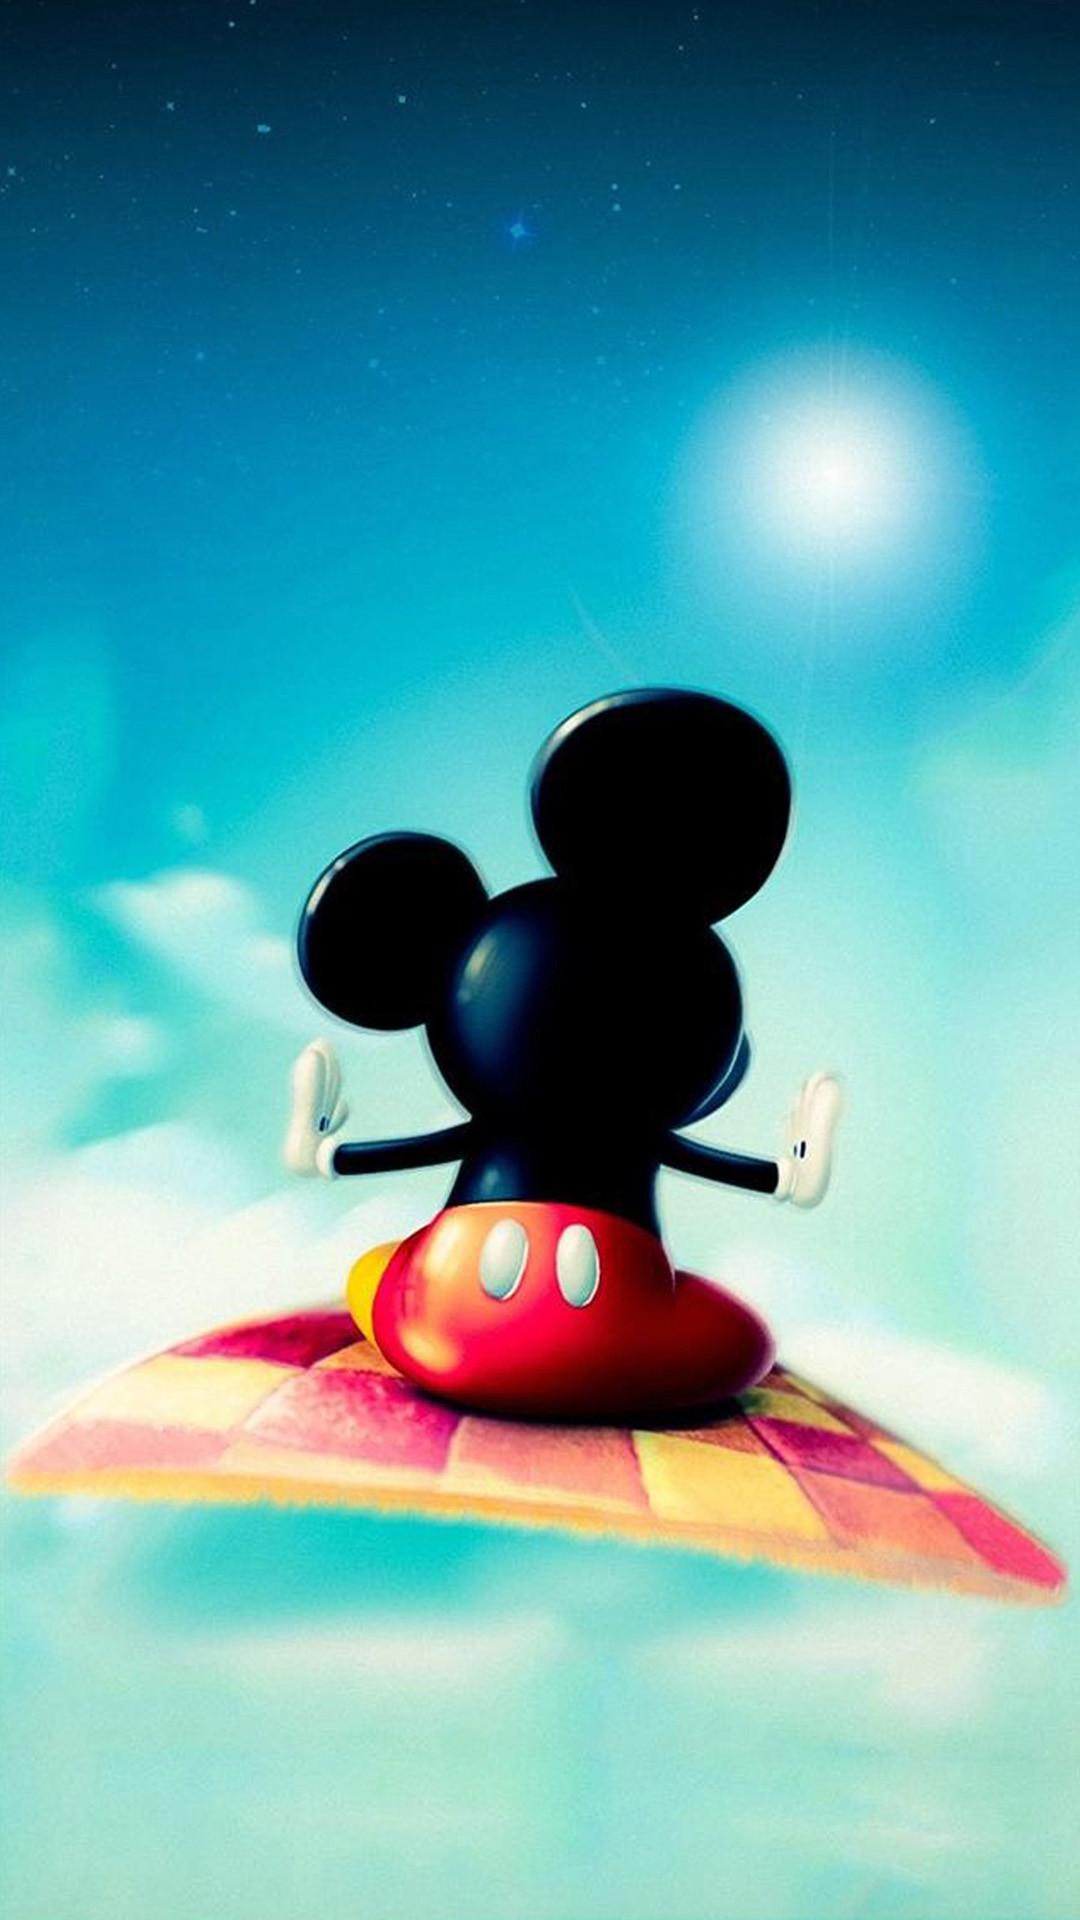 Cute disney character wallpaper 57 images - Disney world wallpaper iphone ...